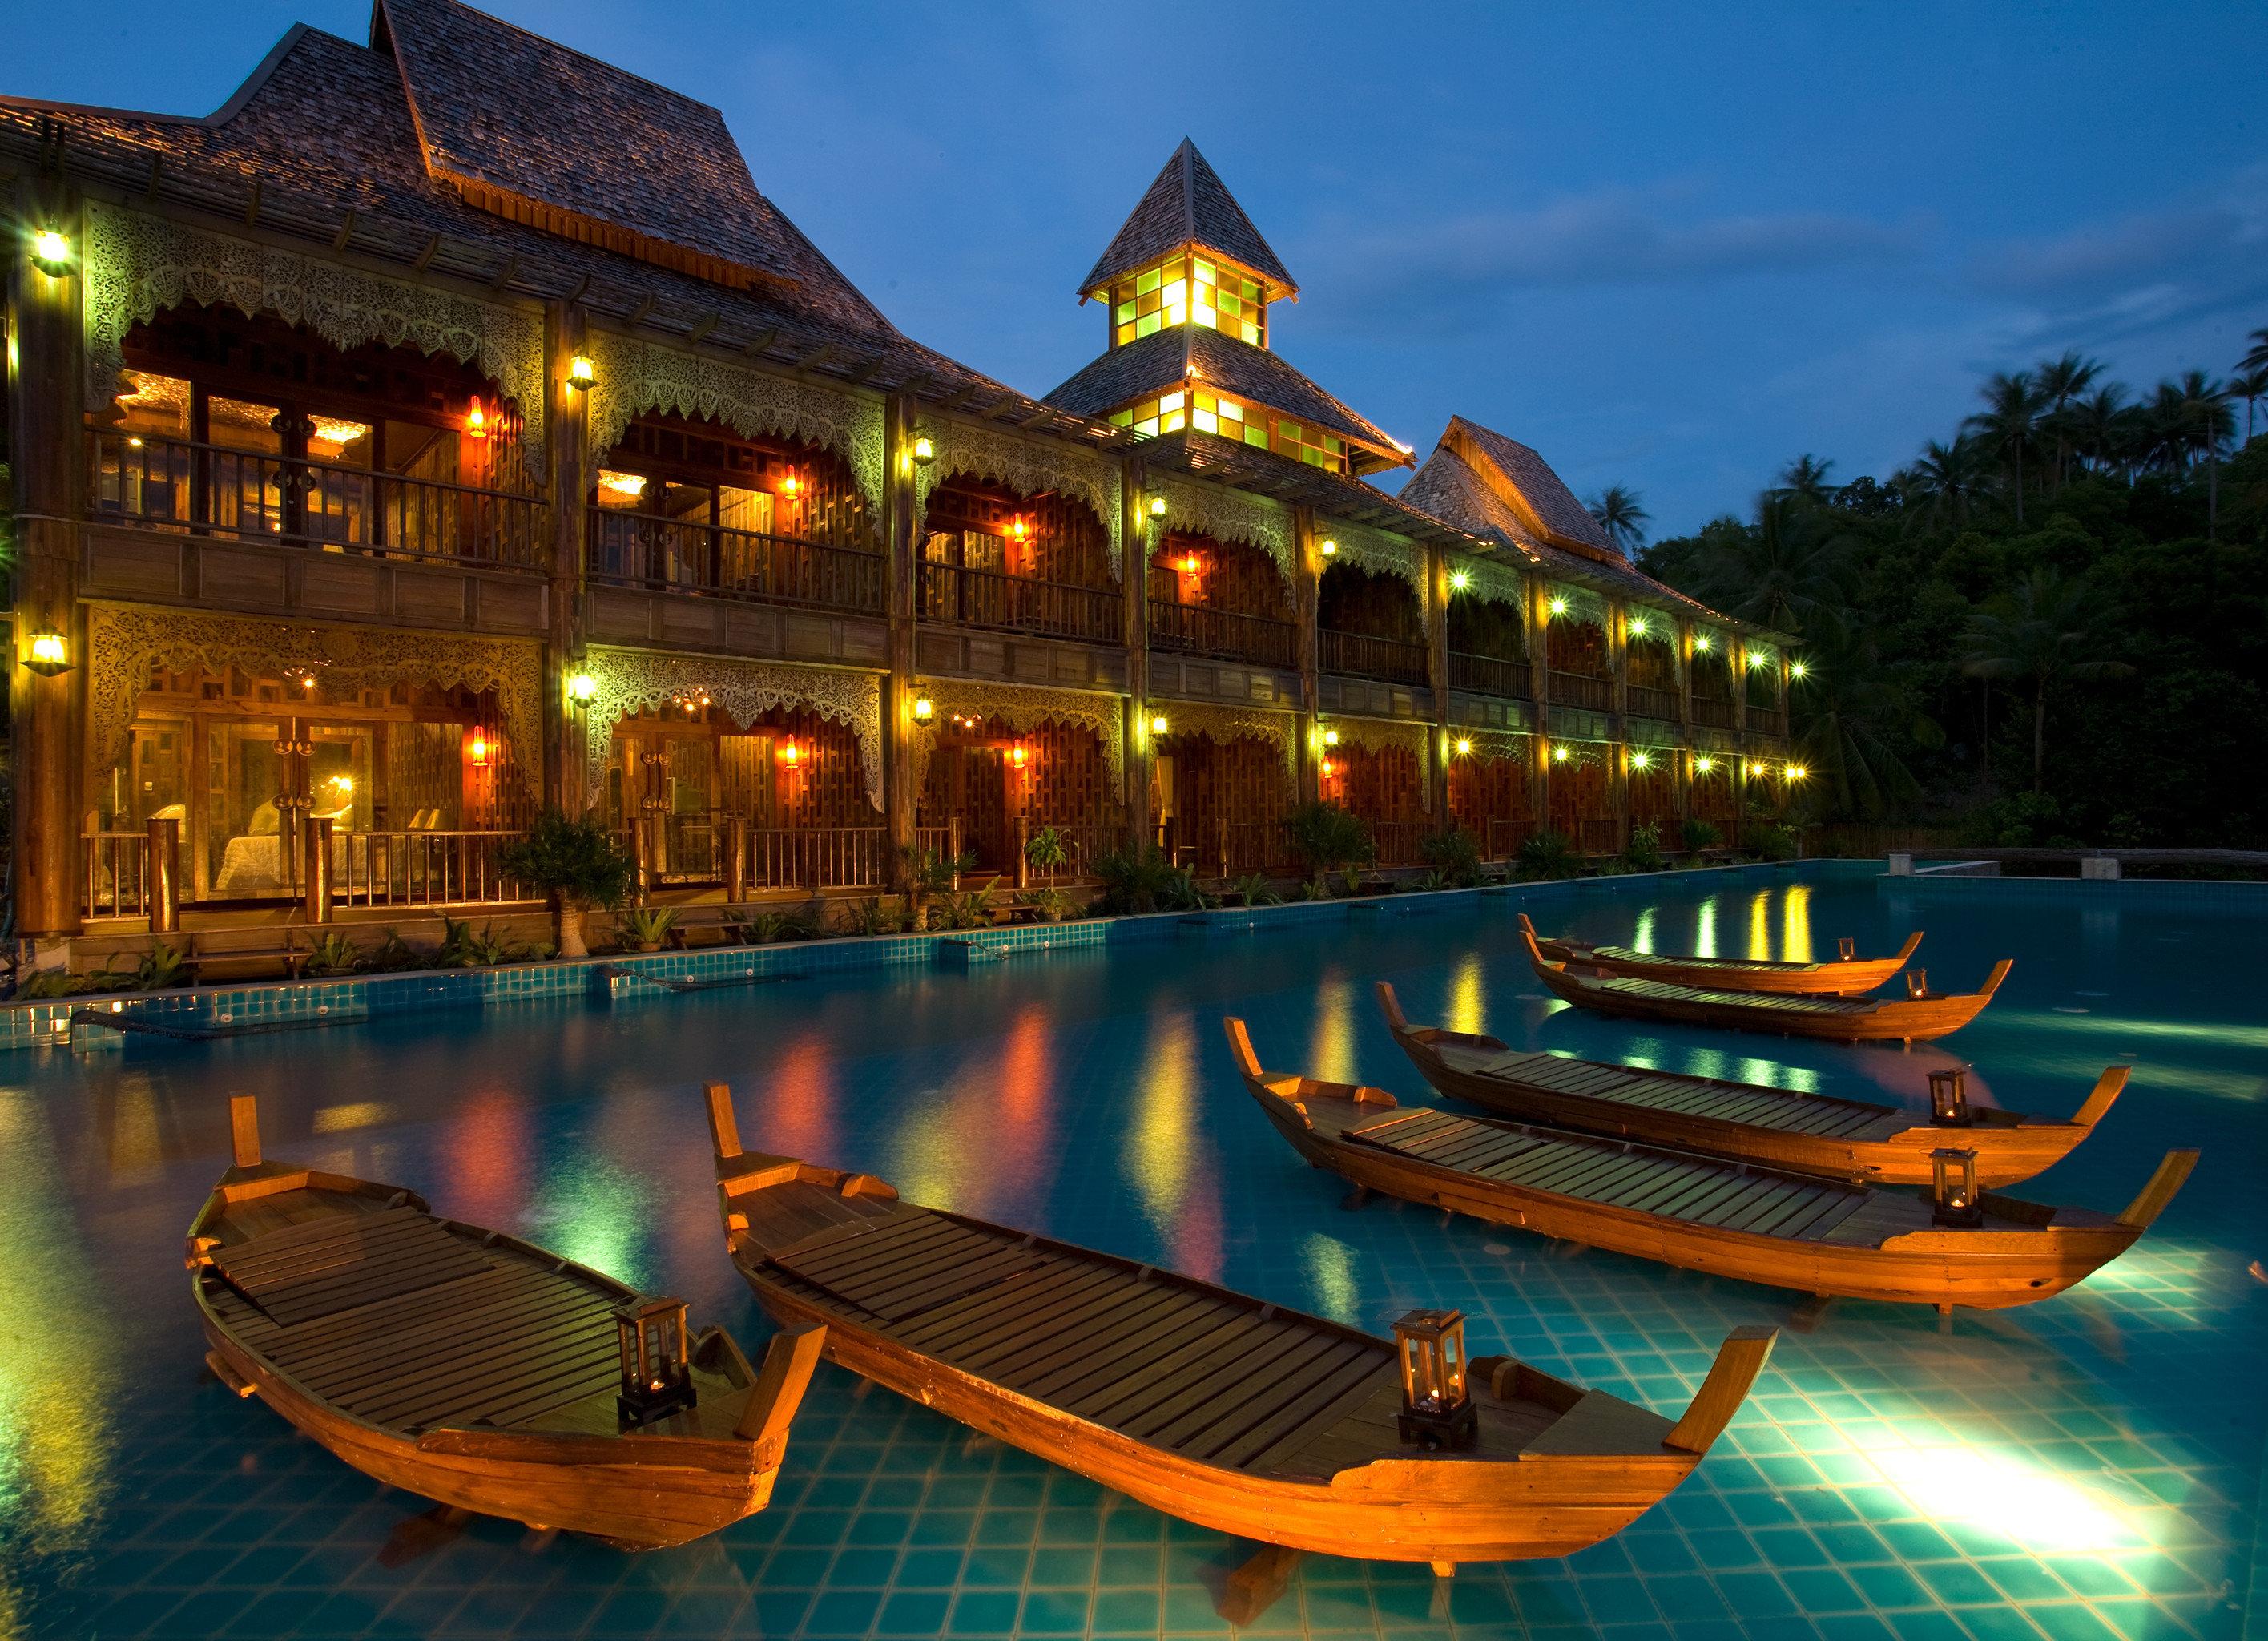 Beachfront Boat Exterior Honeymoon Jungle Pool Romance Romantic Tropical Waterfront sky water Resort evening vehicle